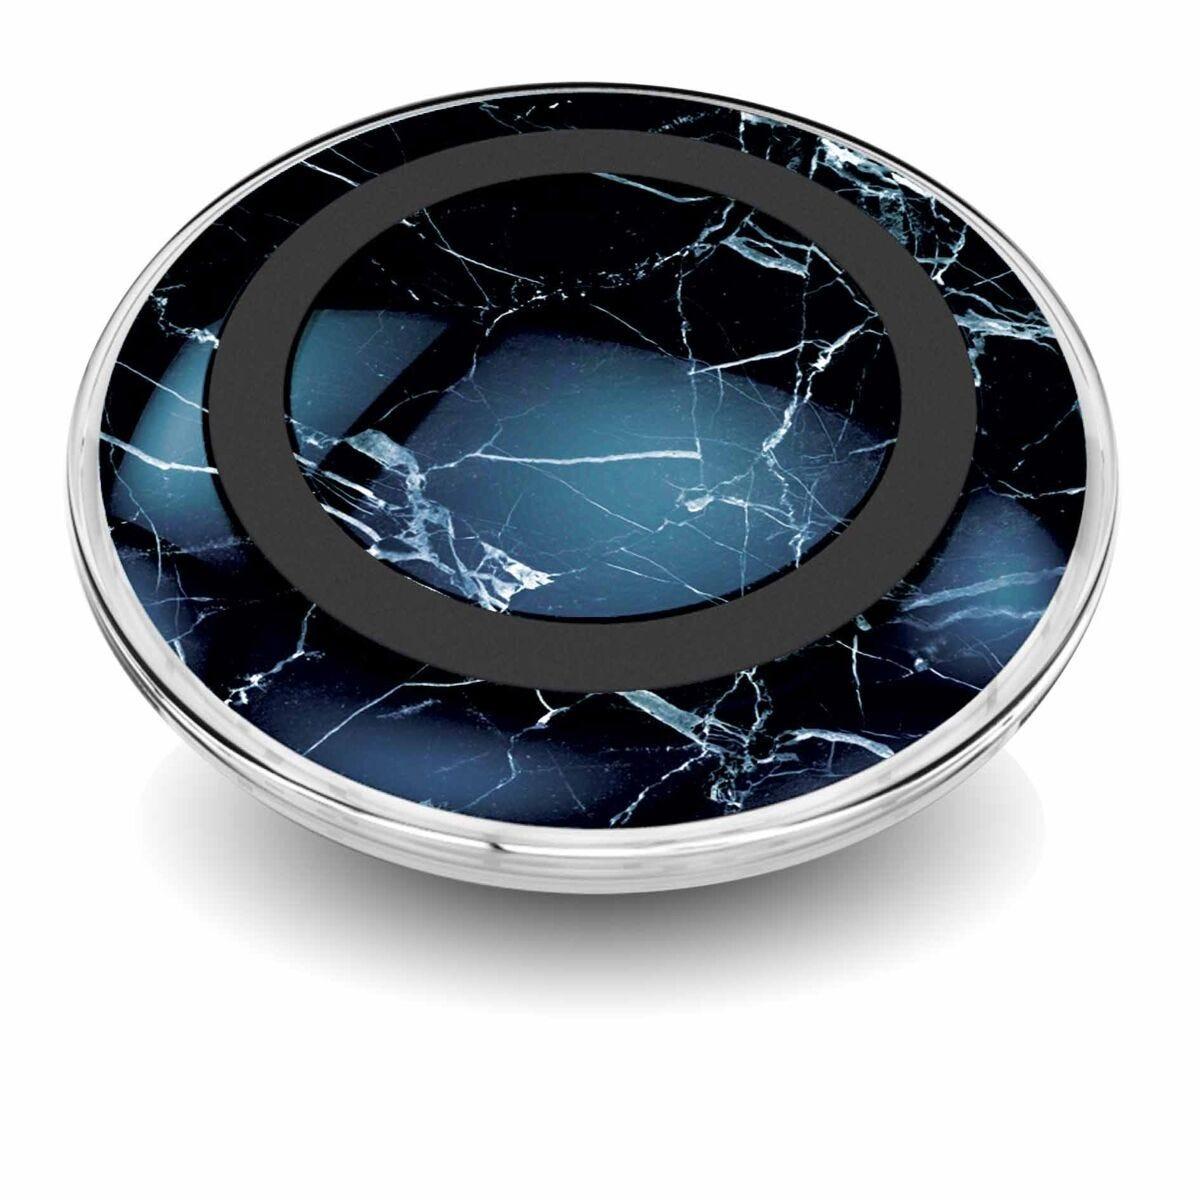 Mayhem Wireless Phone Charger 5W Marble